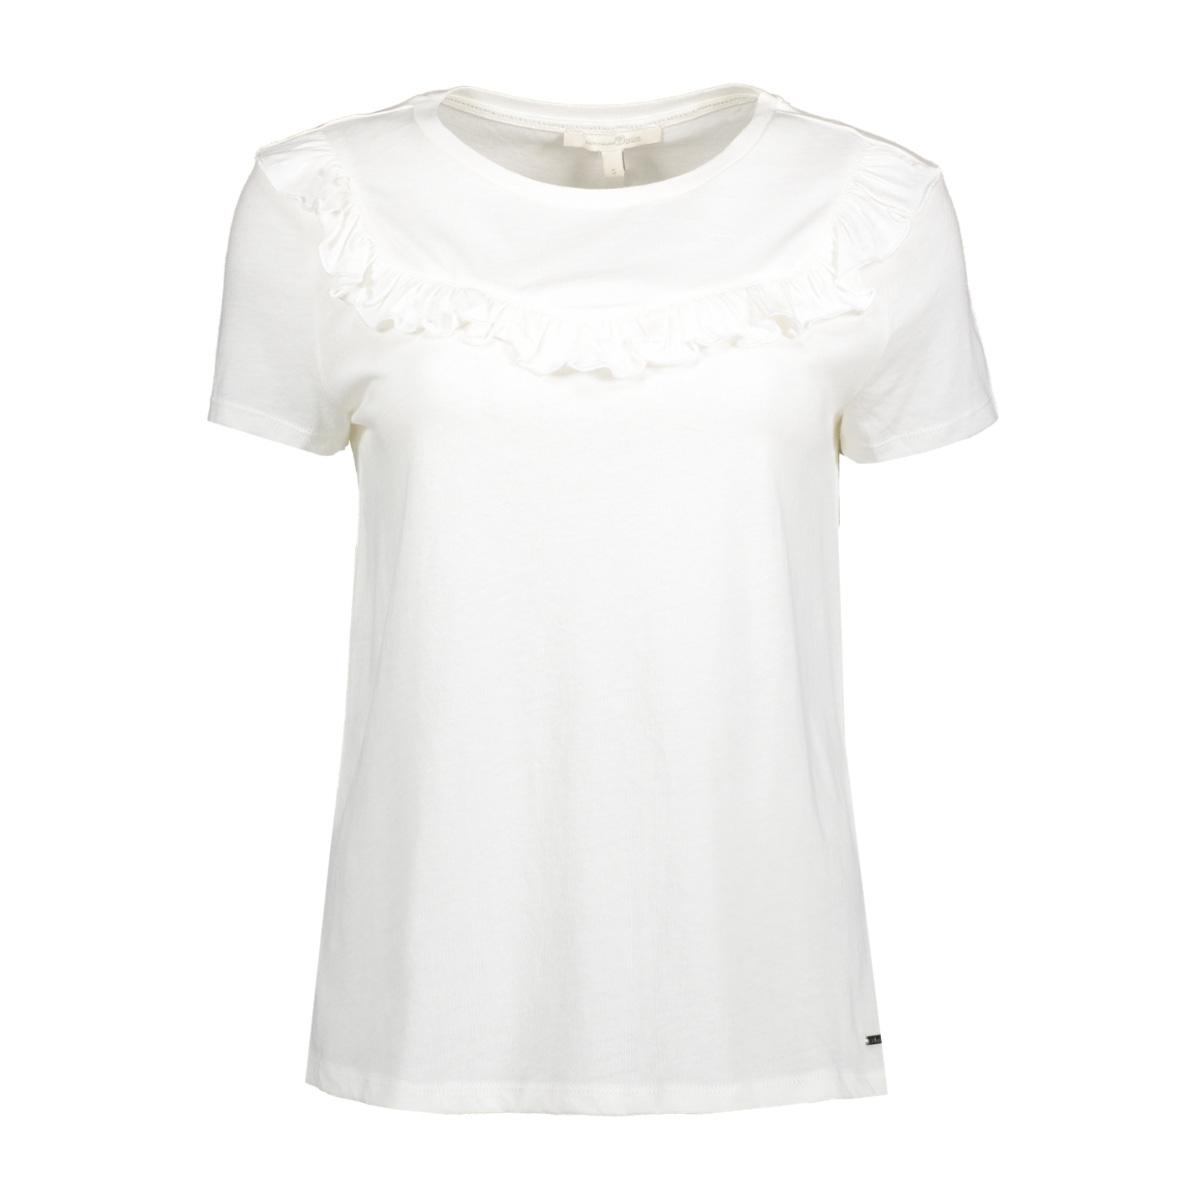 1055036.00.71 tom tailor t-shirt 8005